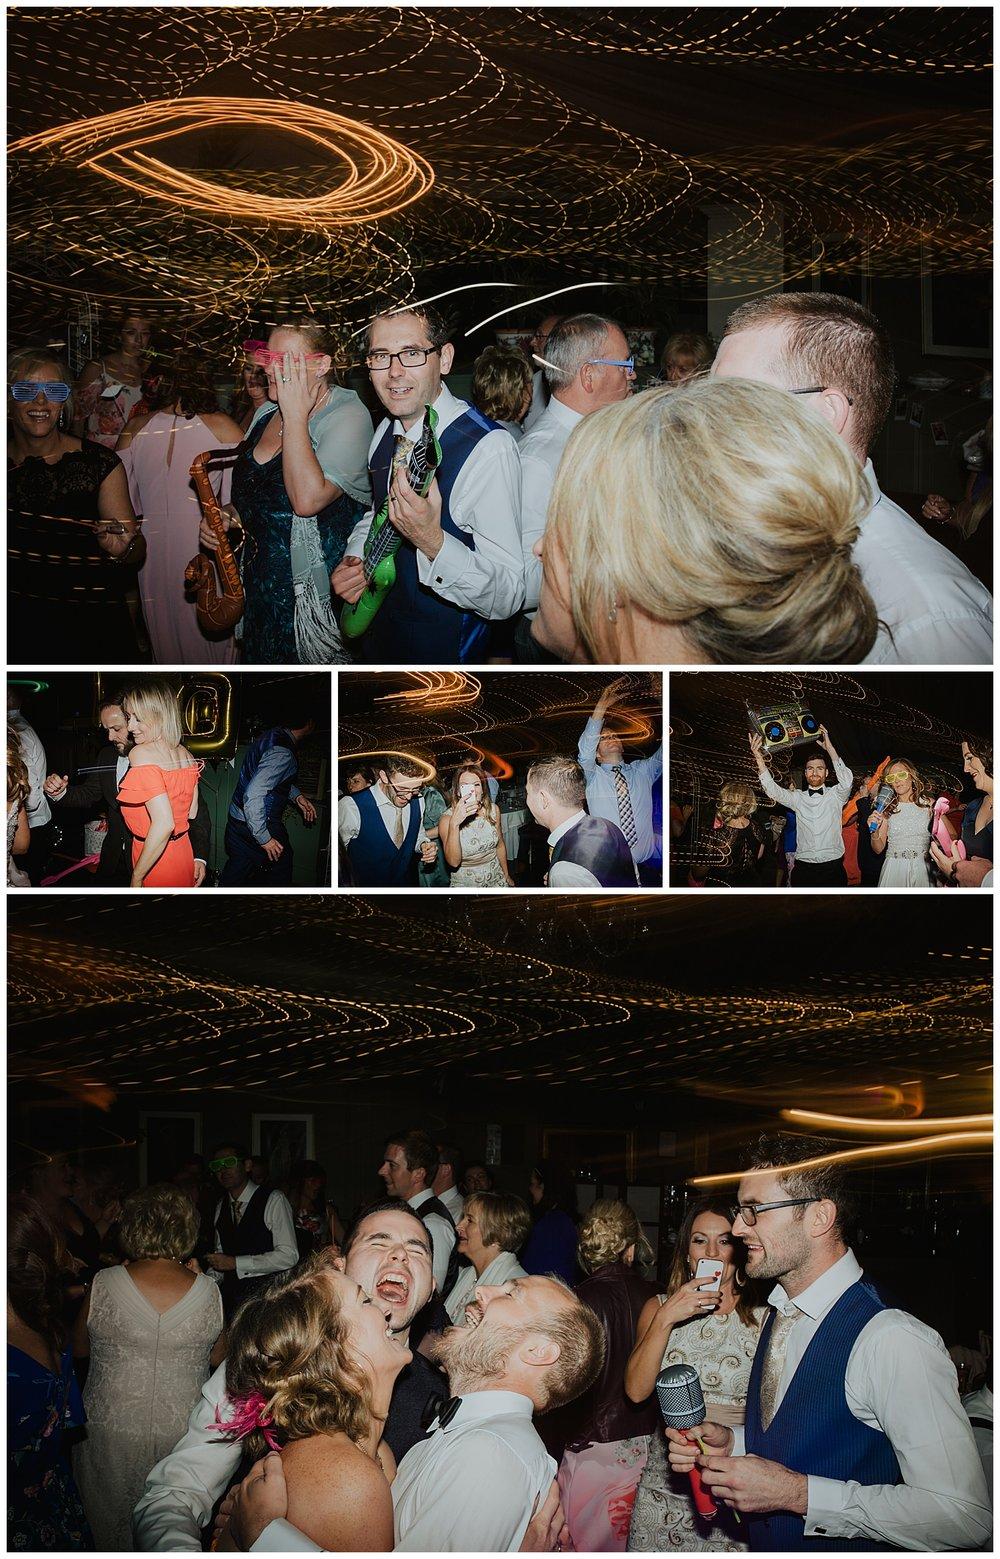 a&c_tinakilly_black_tie_wedding_photographer_livia_figueiredo_288.jpg